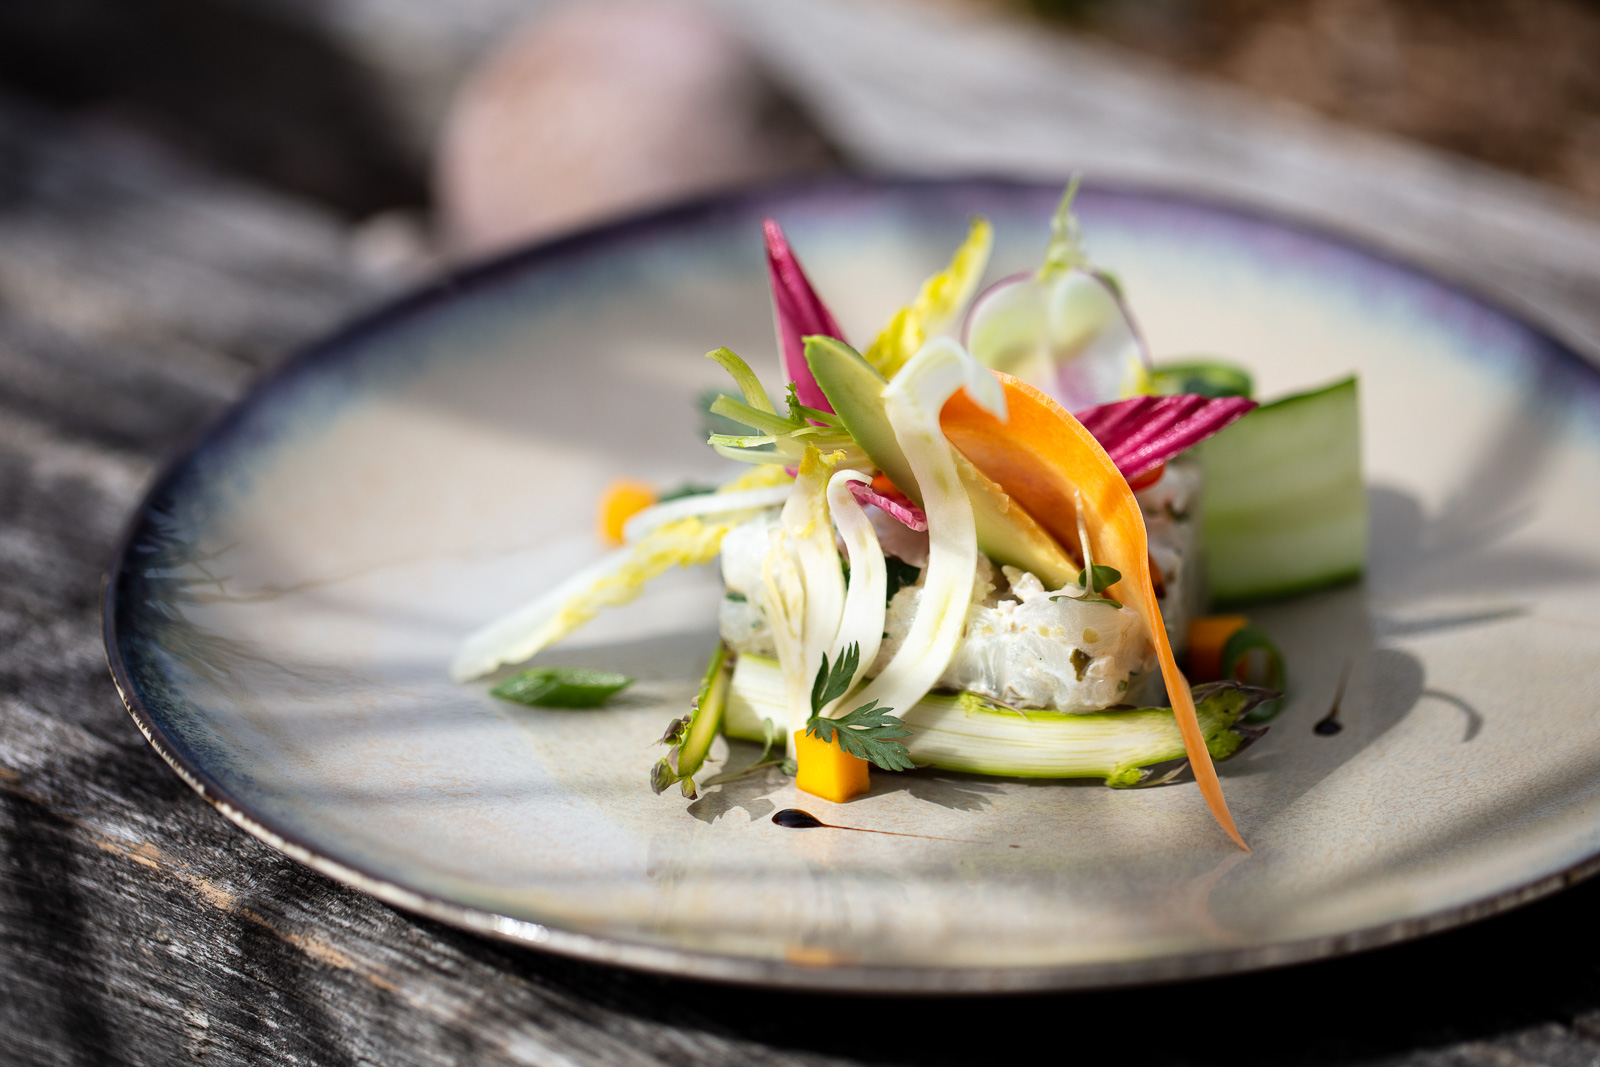 Franck_Hamel_Sofitel_Quiberon_valerie_paumelle_agent-photographe_culinaire-foodphotographer (3).jpg